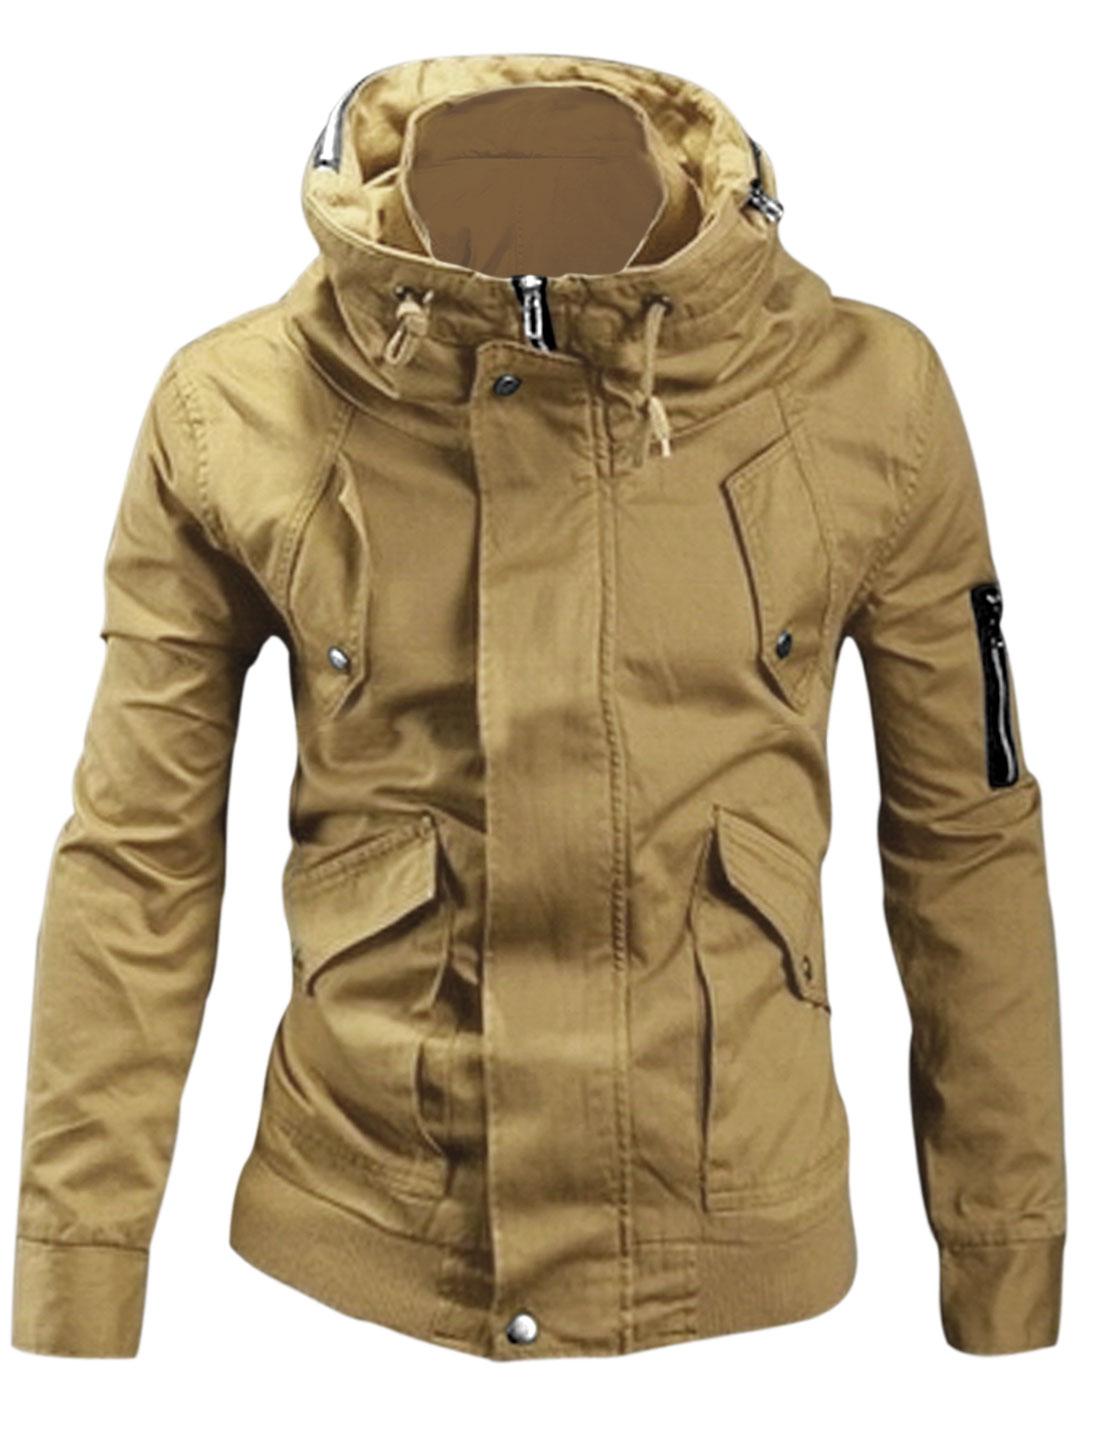 Men Convertible Collar Buttoned Cuffs New Style Jacket Khaki M